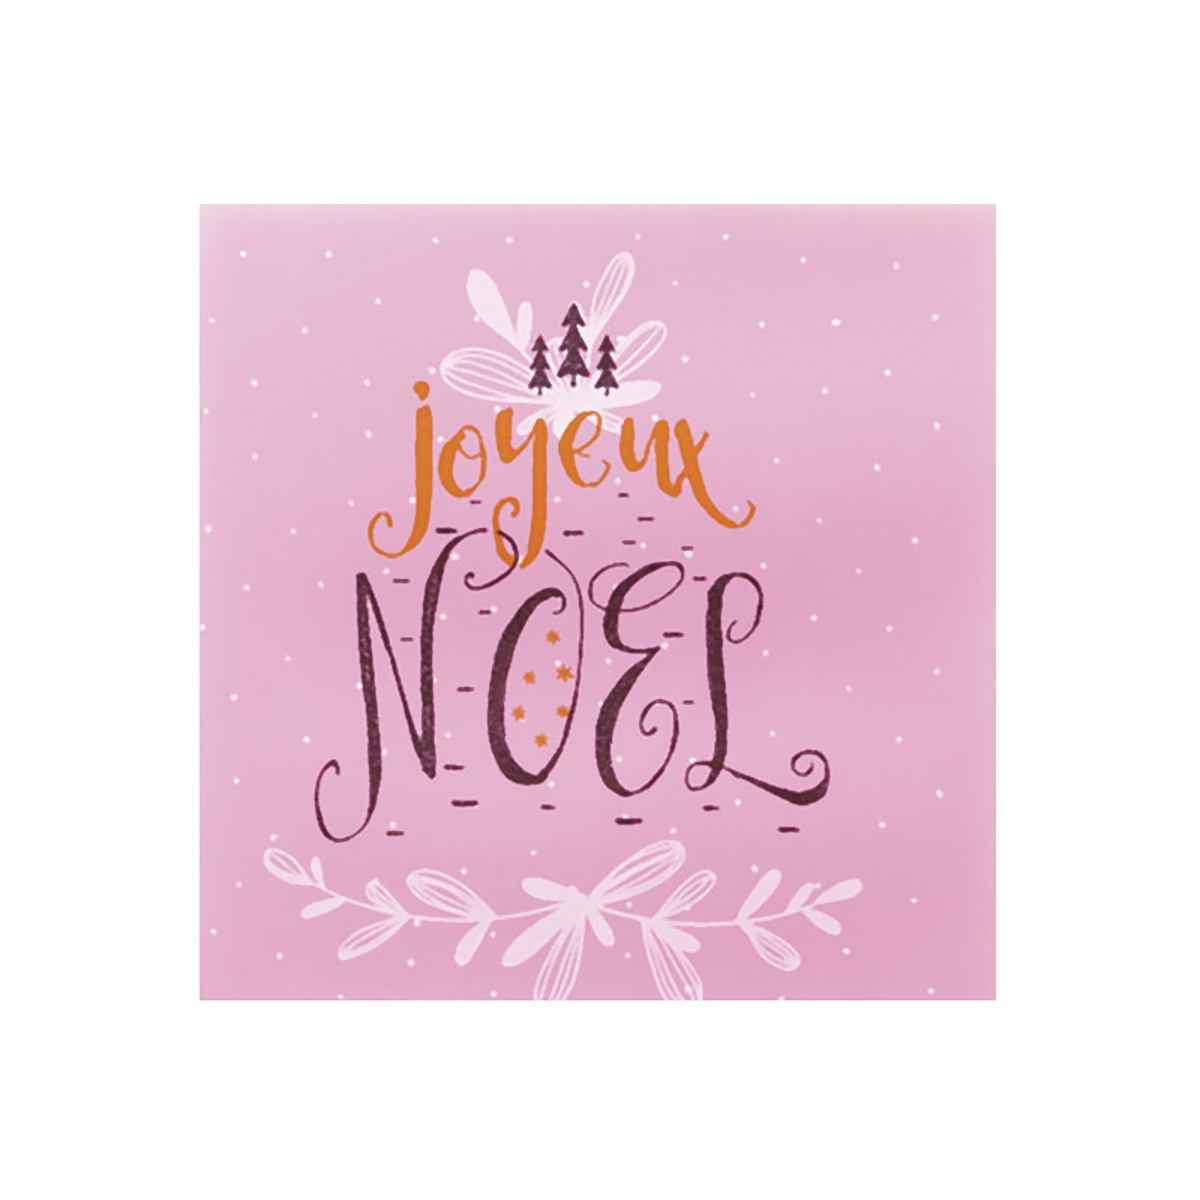 Www Joyeux Noel.120 Carres Cb Joyeux Noel Rose 4 5 Cm